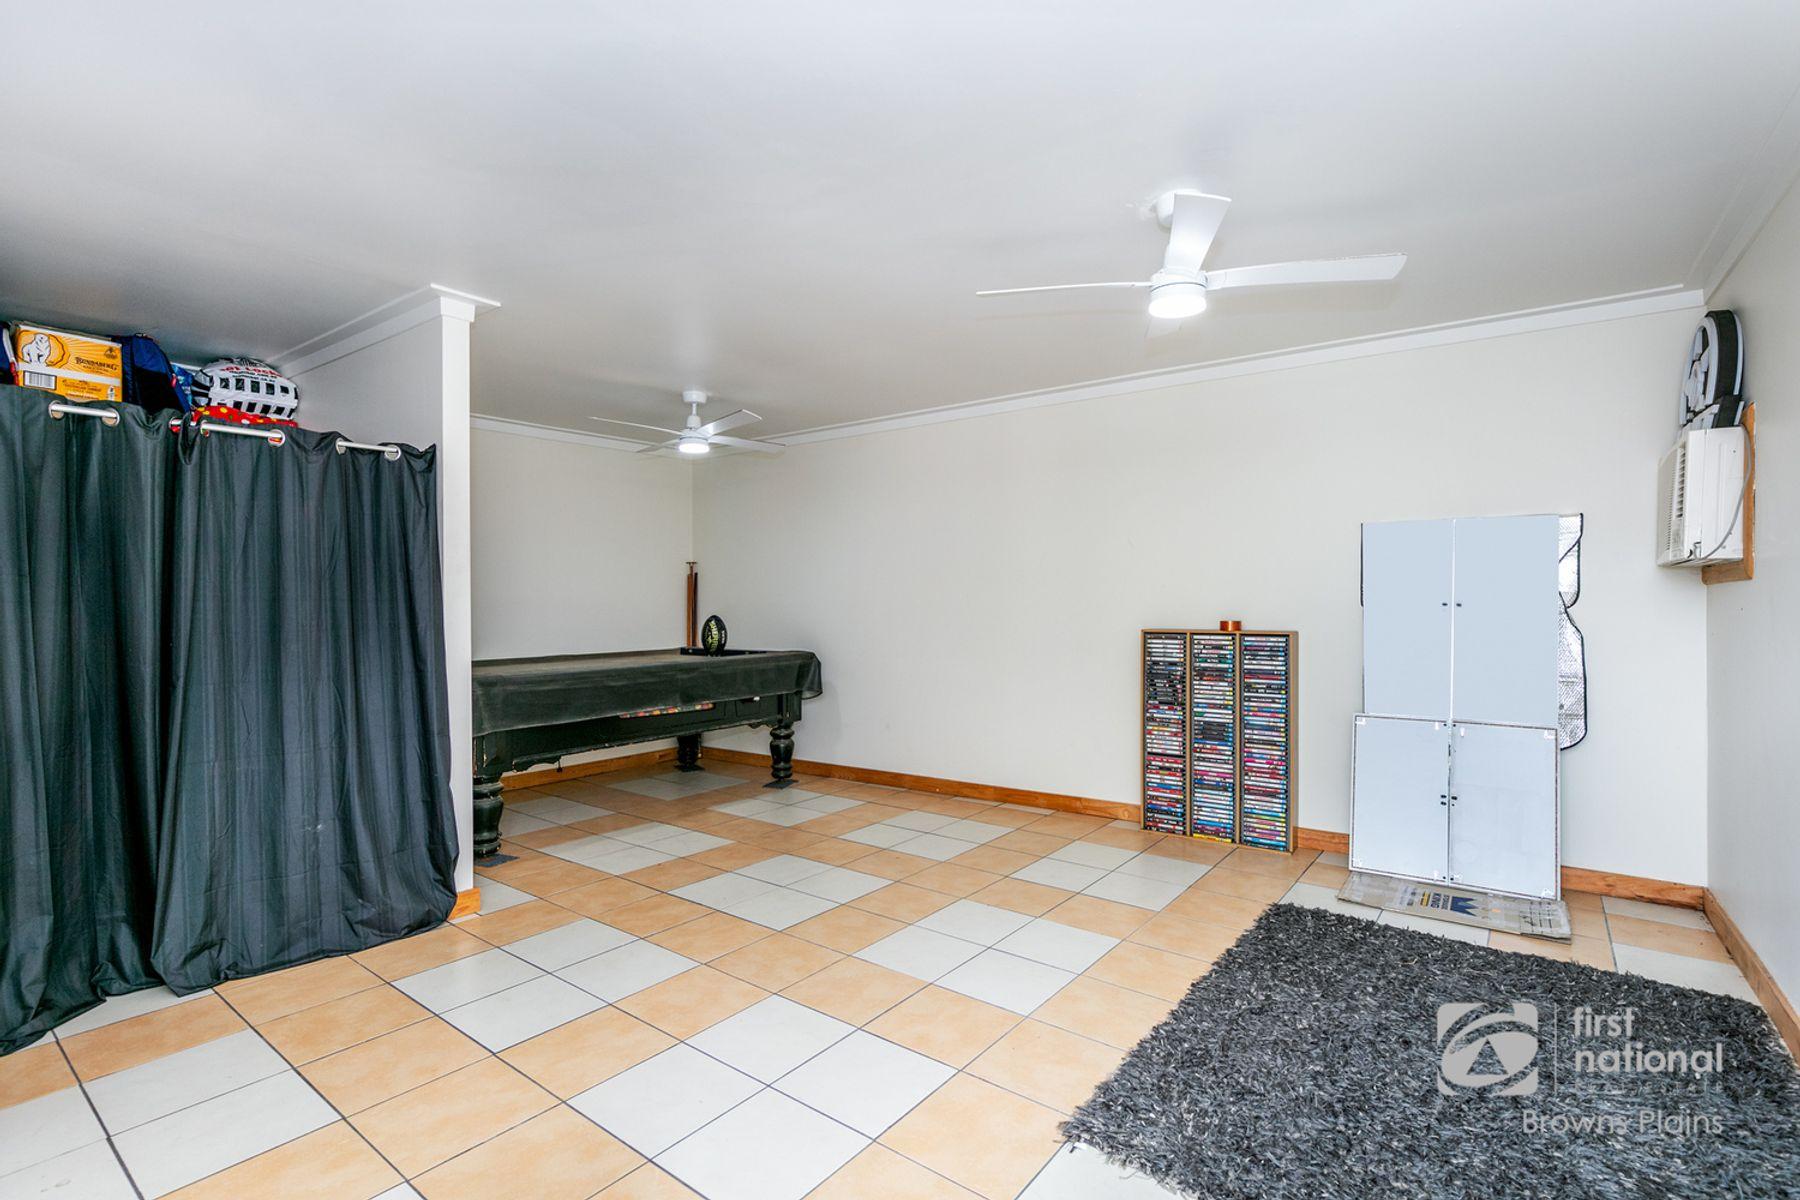 2 Royena Court, Crestmead, QLD 4132